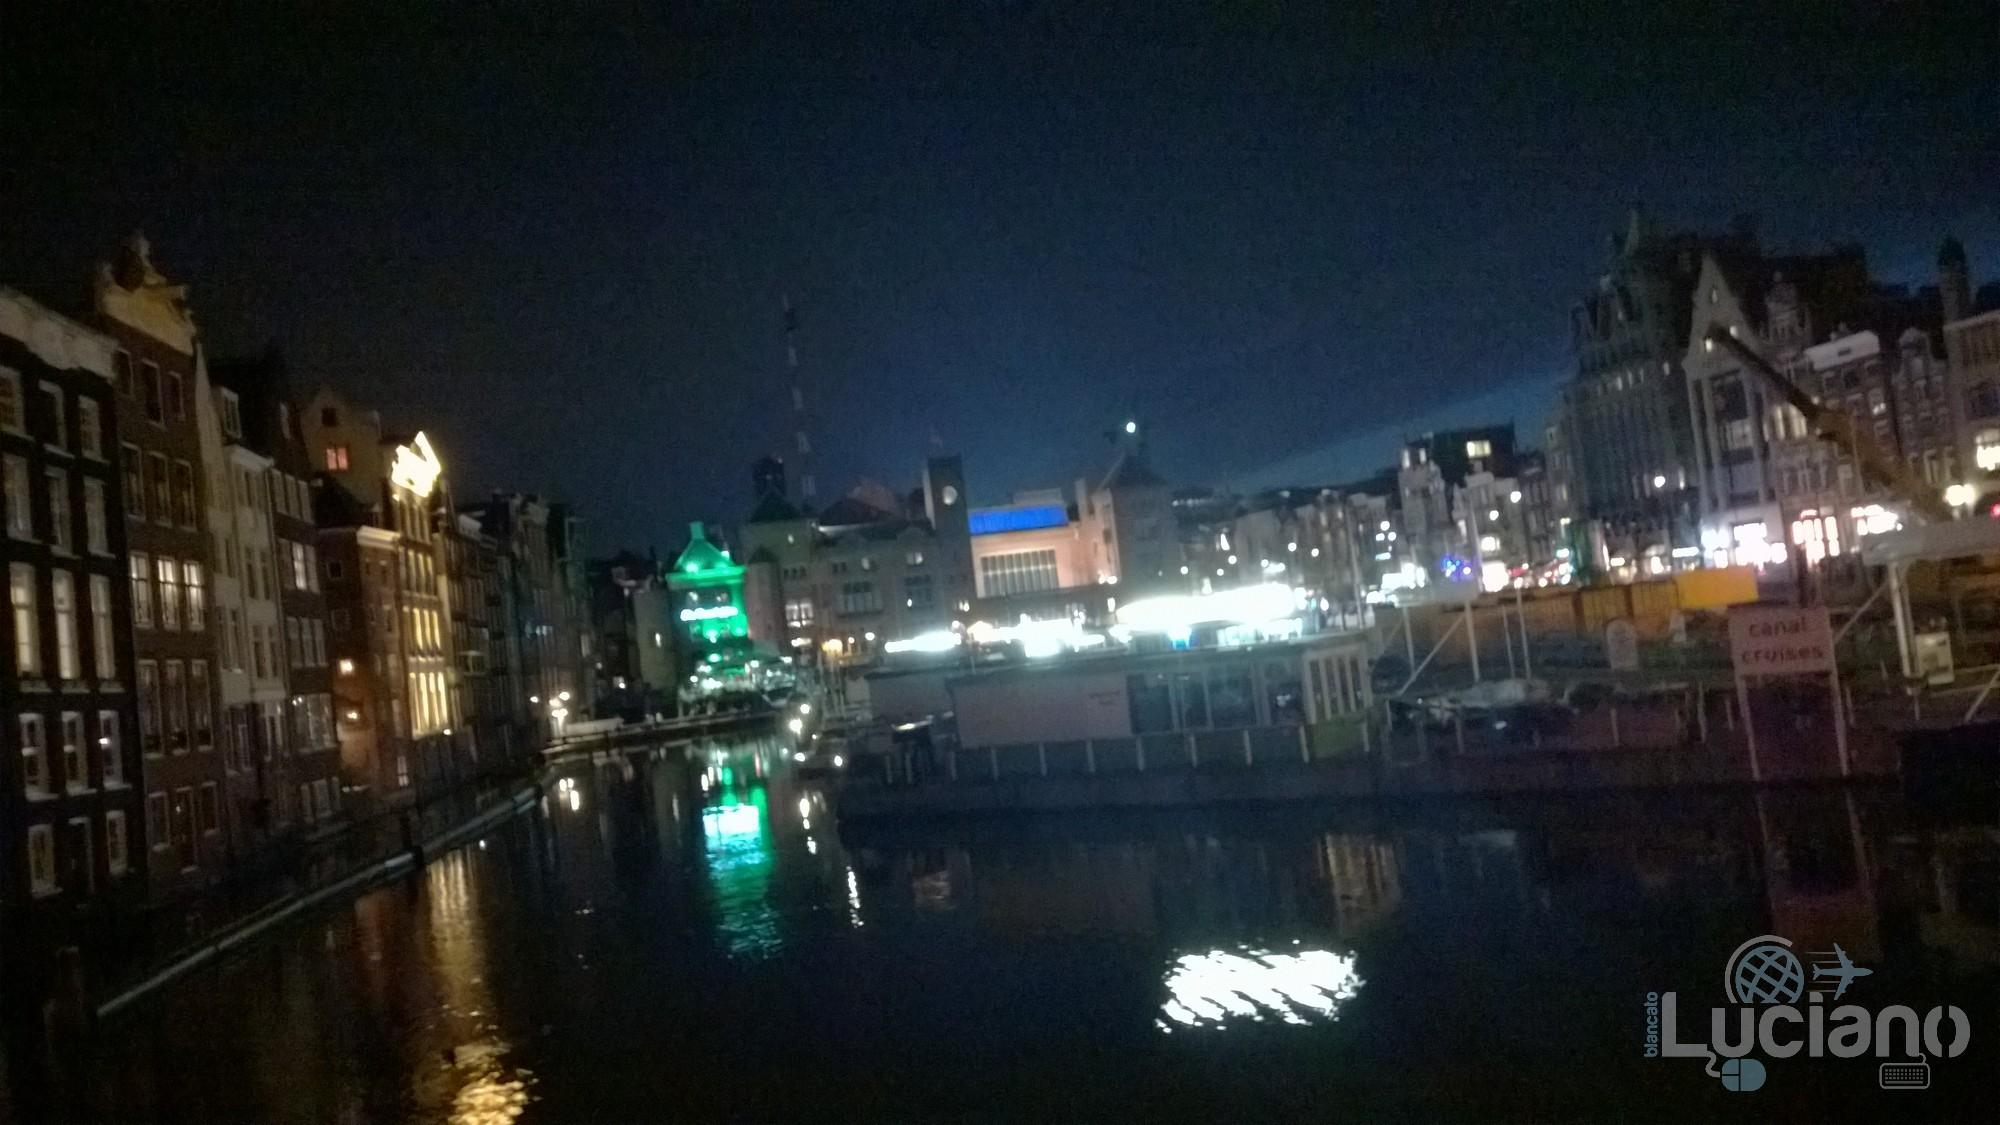 amsterdam-2014-vueling-lucianoblancatoit (68)